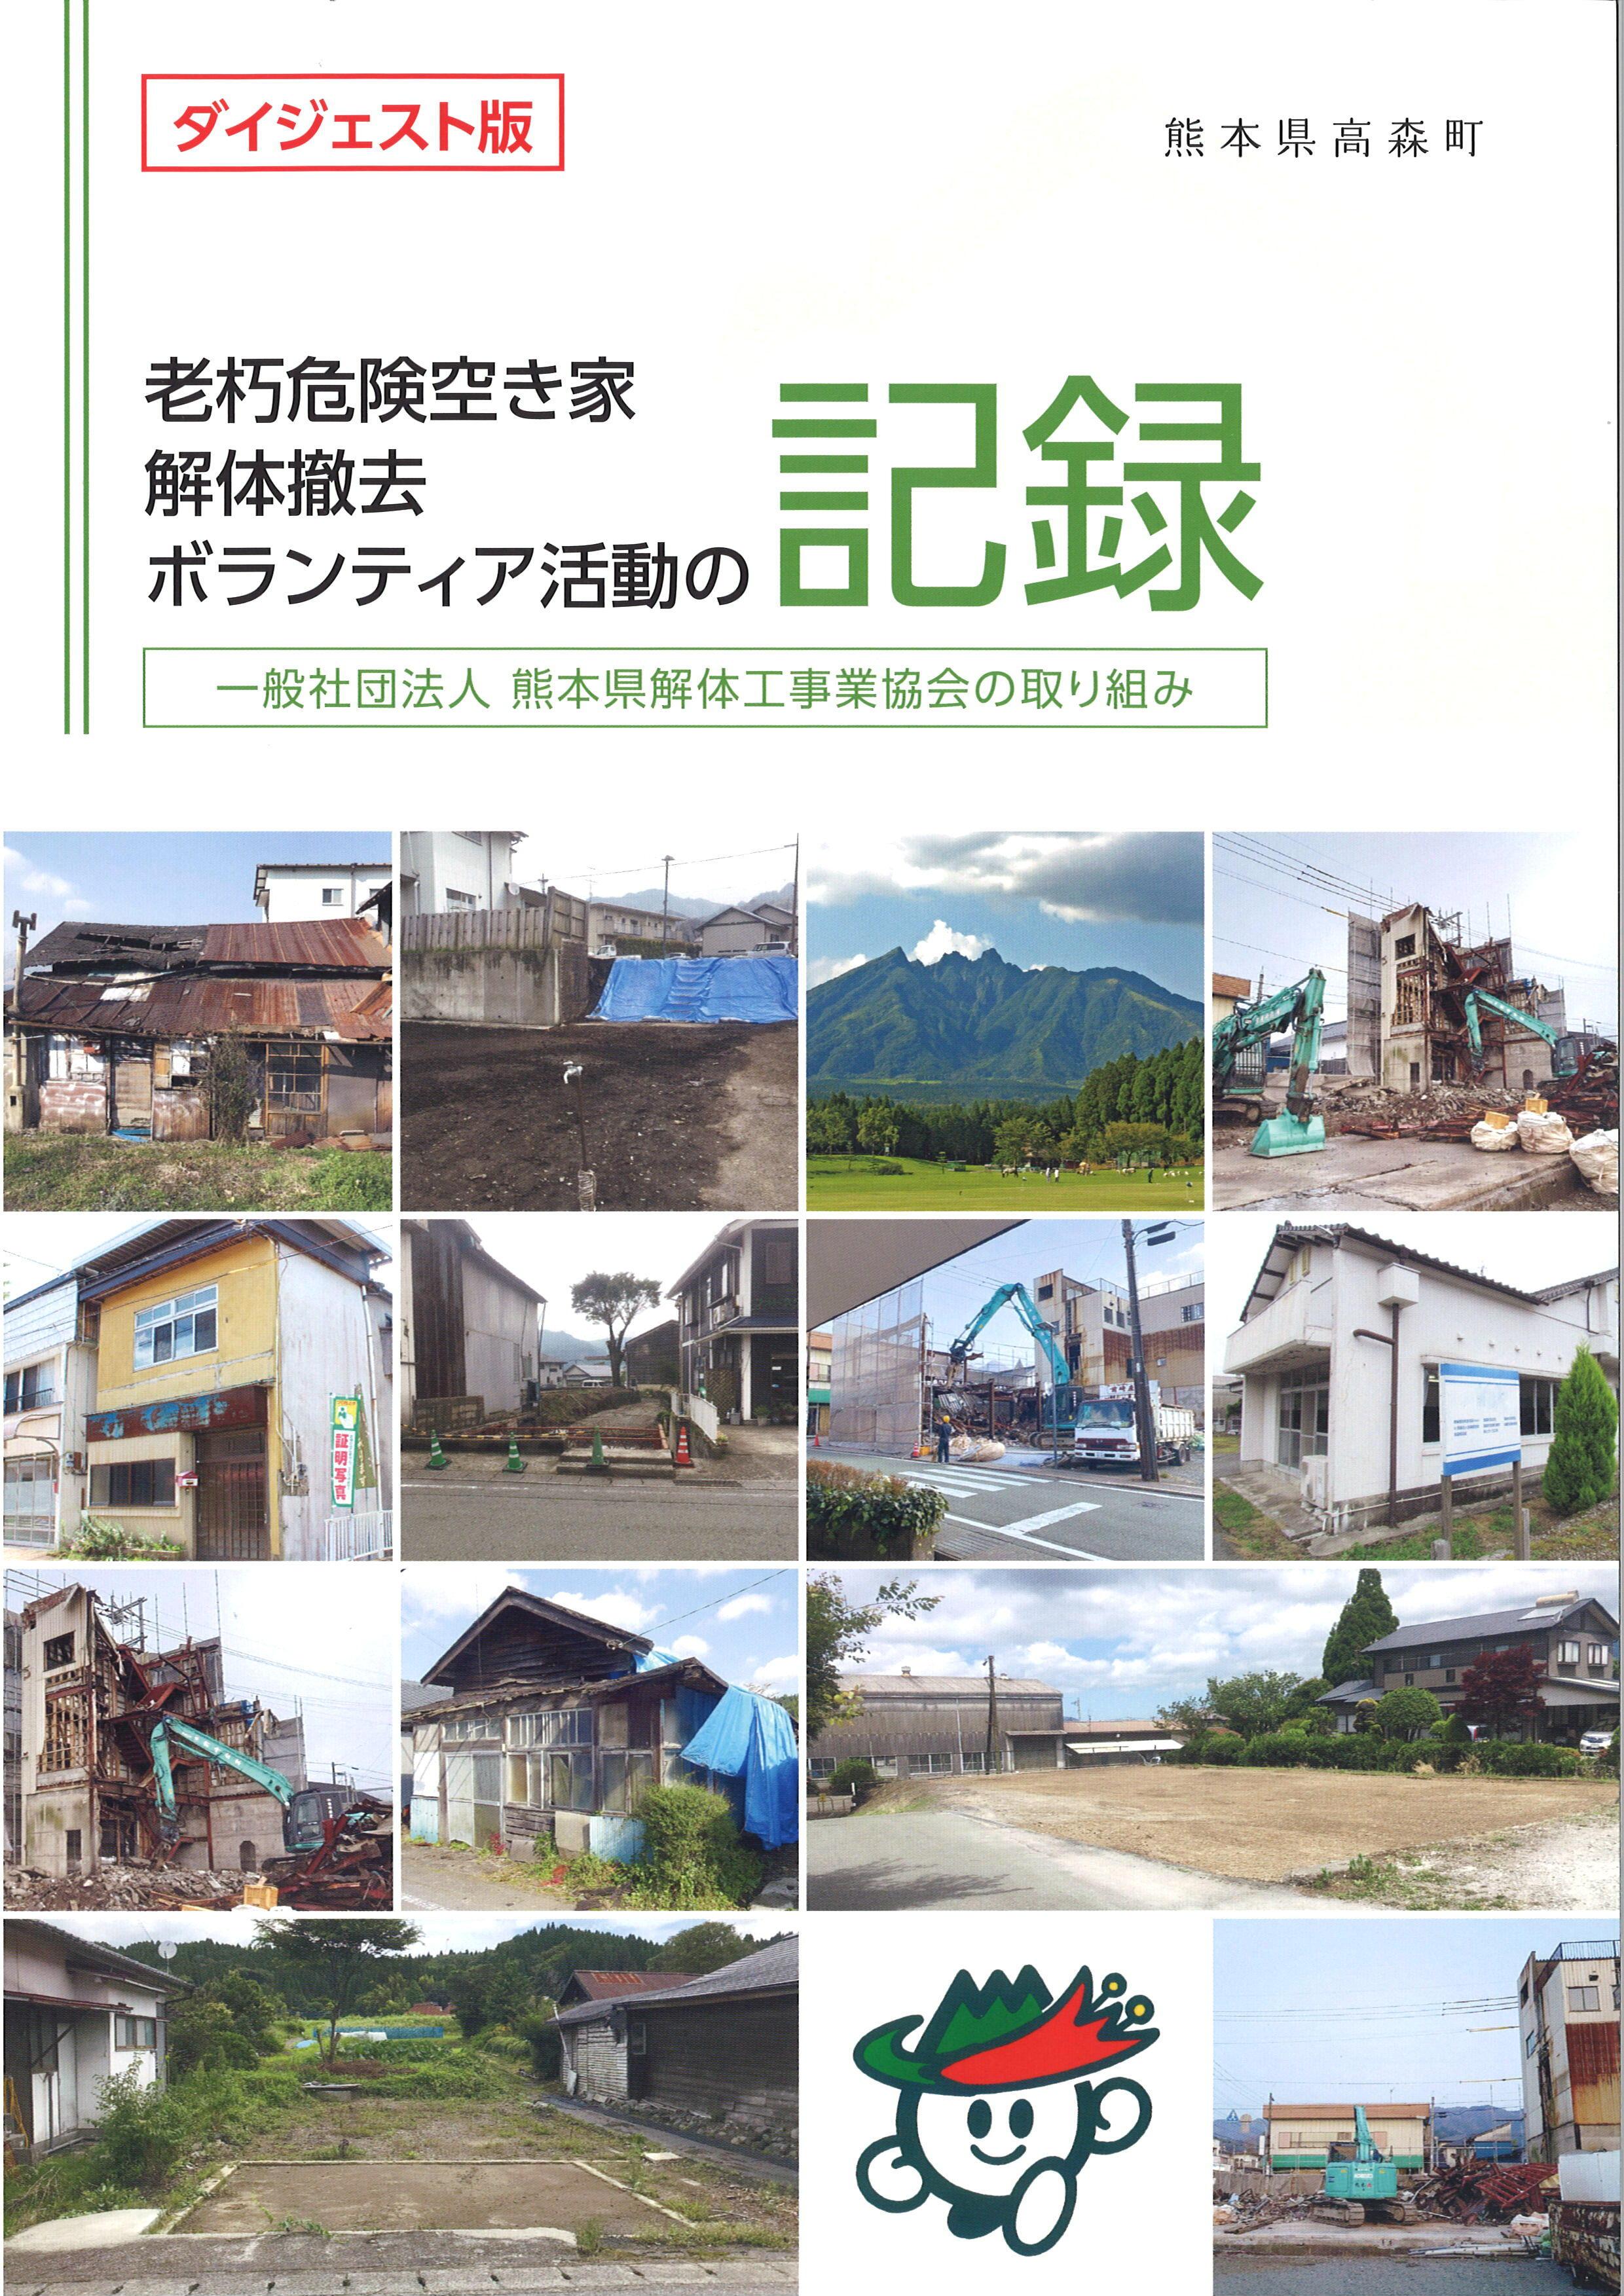 http://www.town.takamori.kumamoto.jp/chosha/somu/upload/b7698469dd0827f88c88c39859148ce26c8254ef.jpg